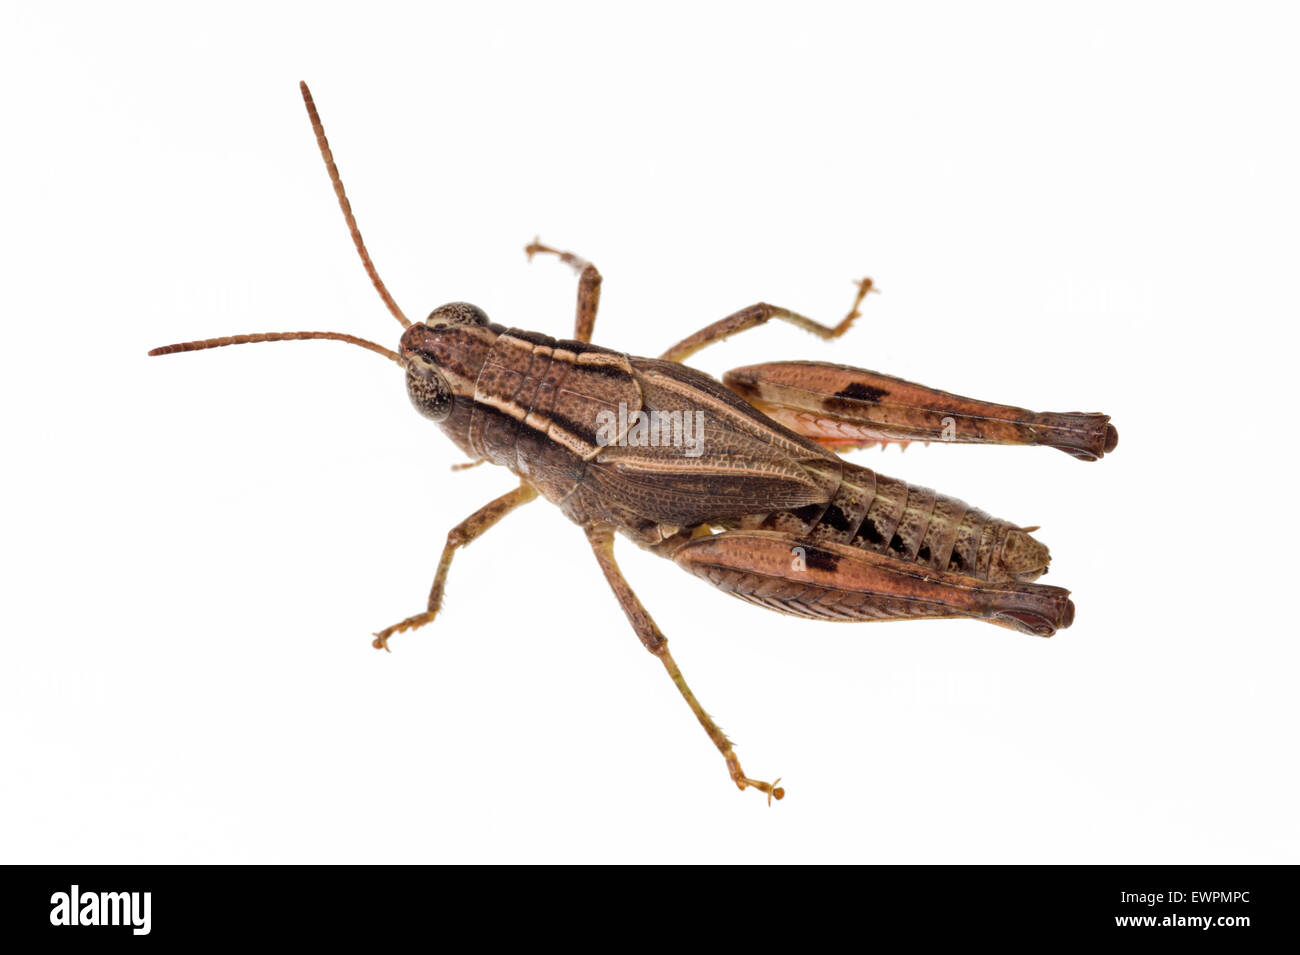 Wingless grasshopper, Phaulacridium vittatum - Stock Image